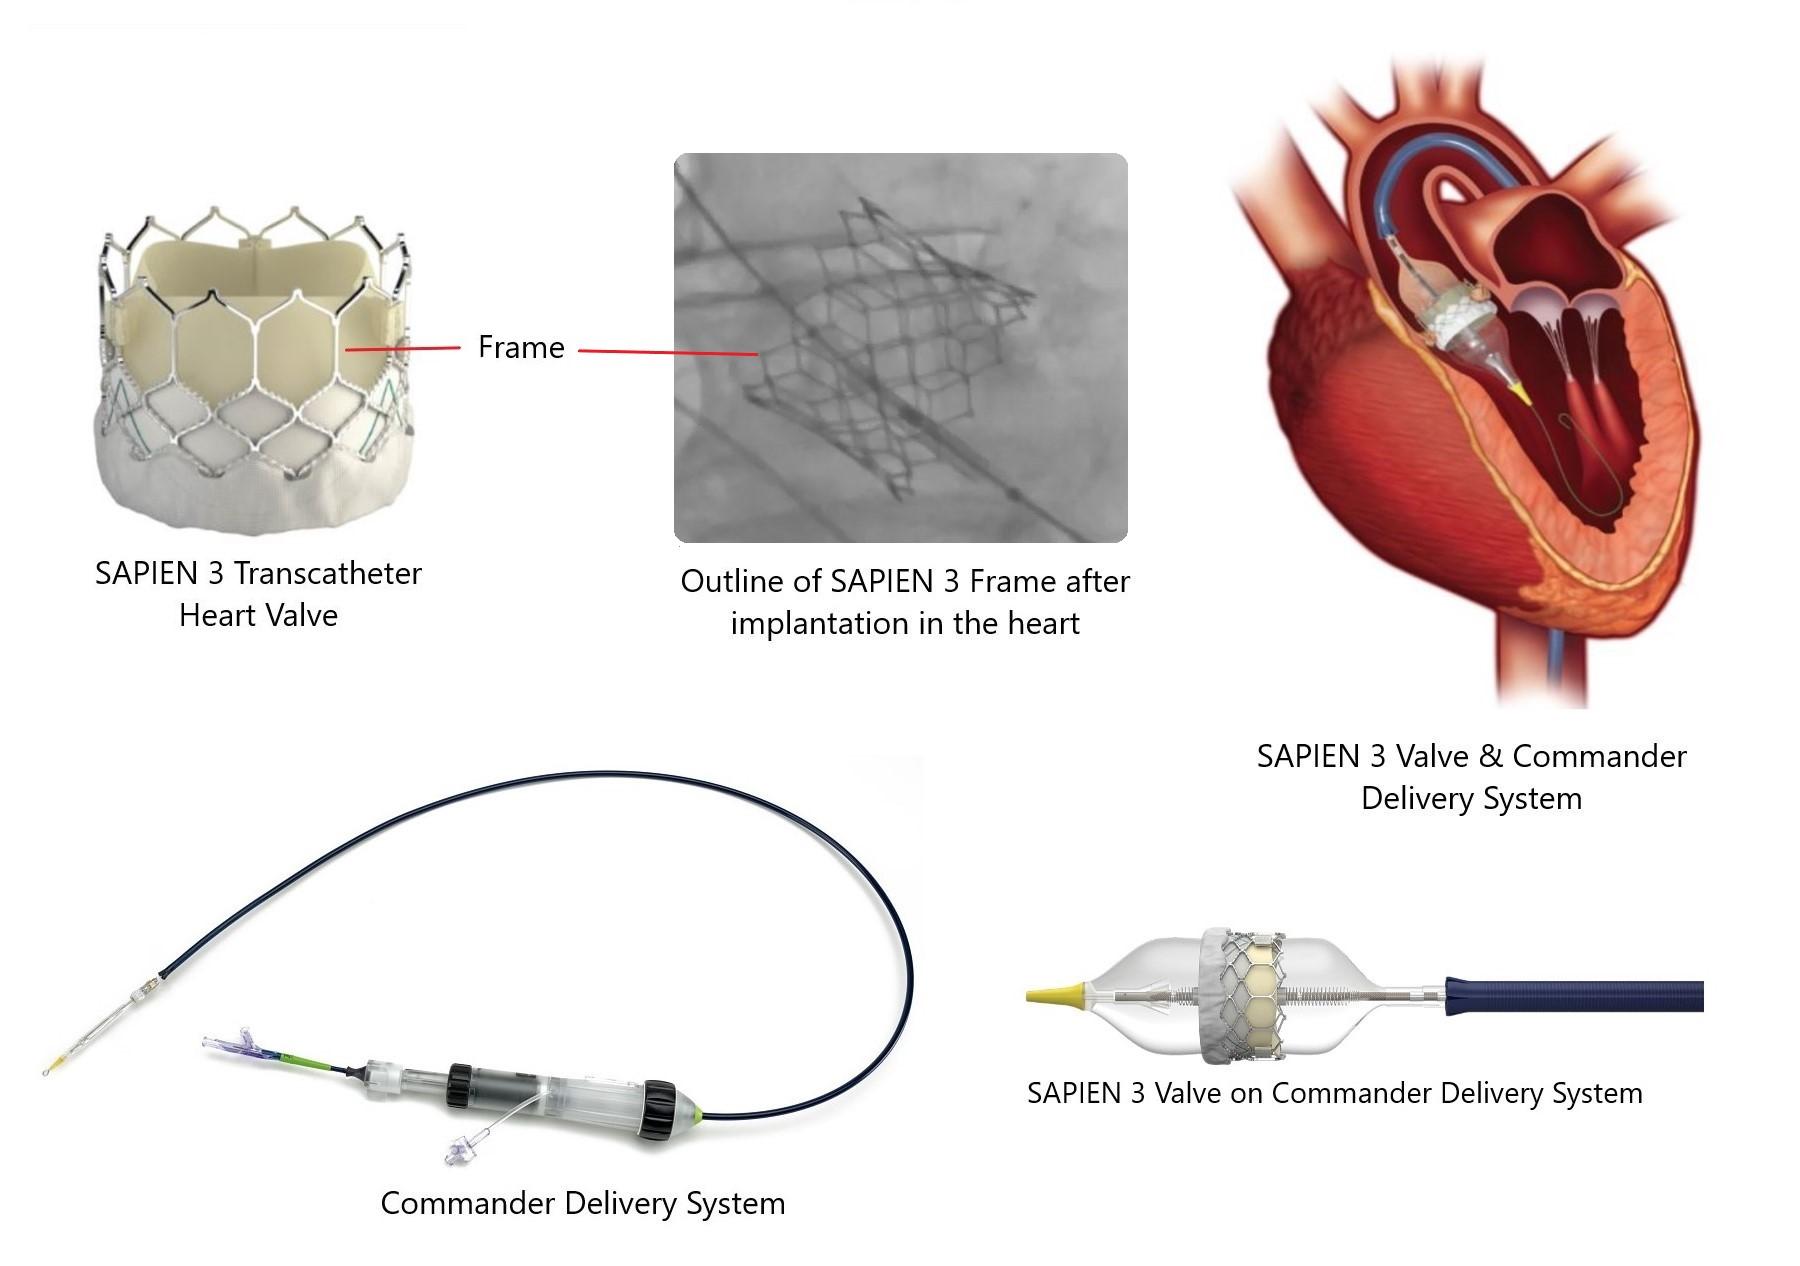 edwards lifesciences sapien 3 transcatheter heart valve frame and commander delivery system